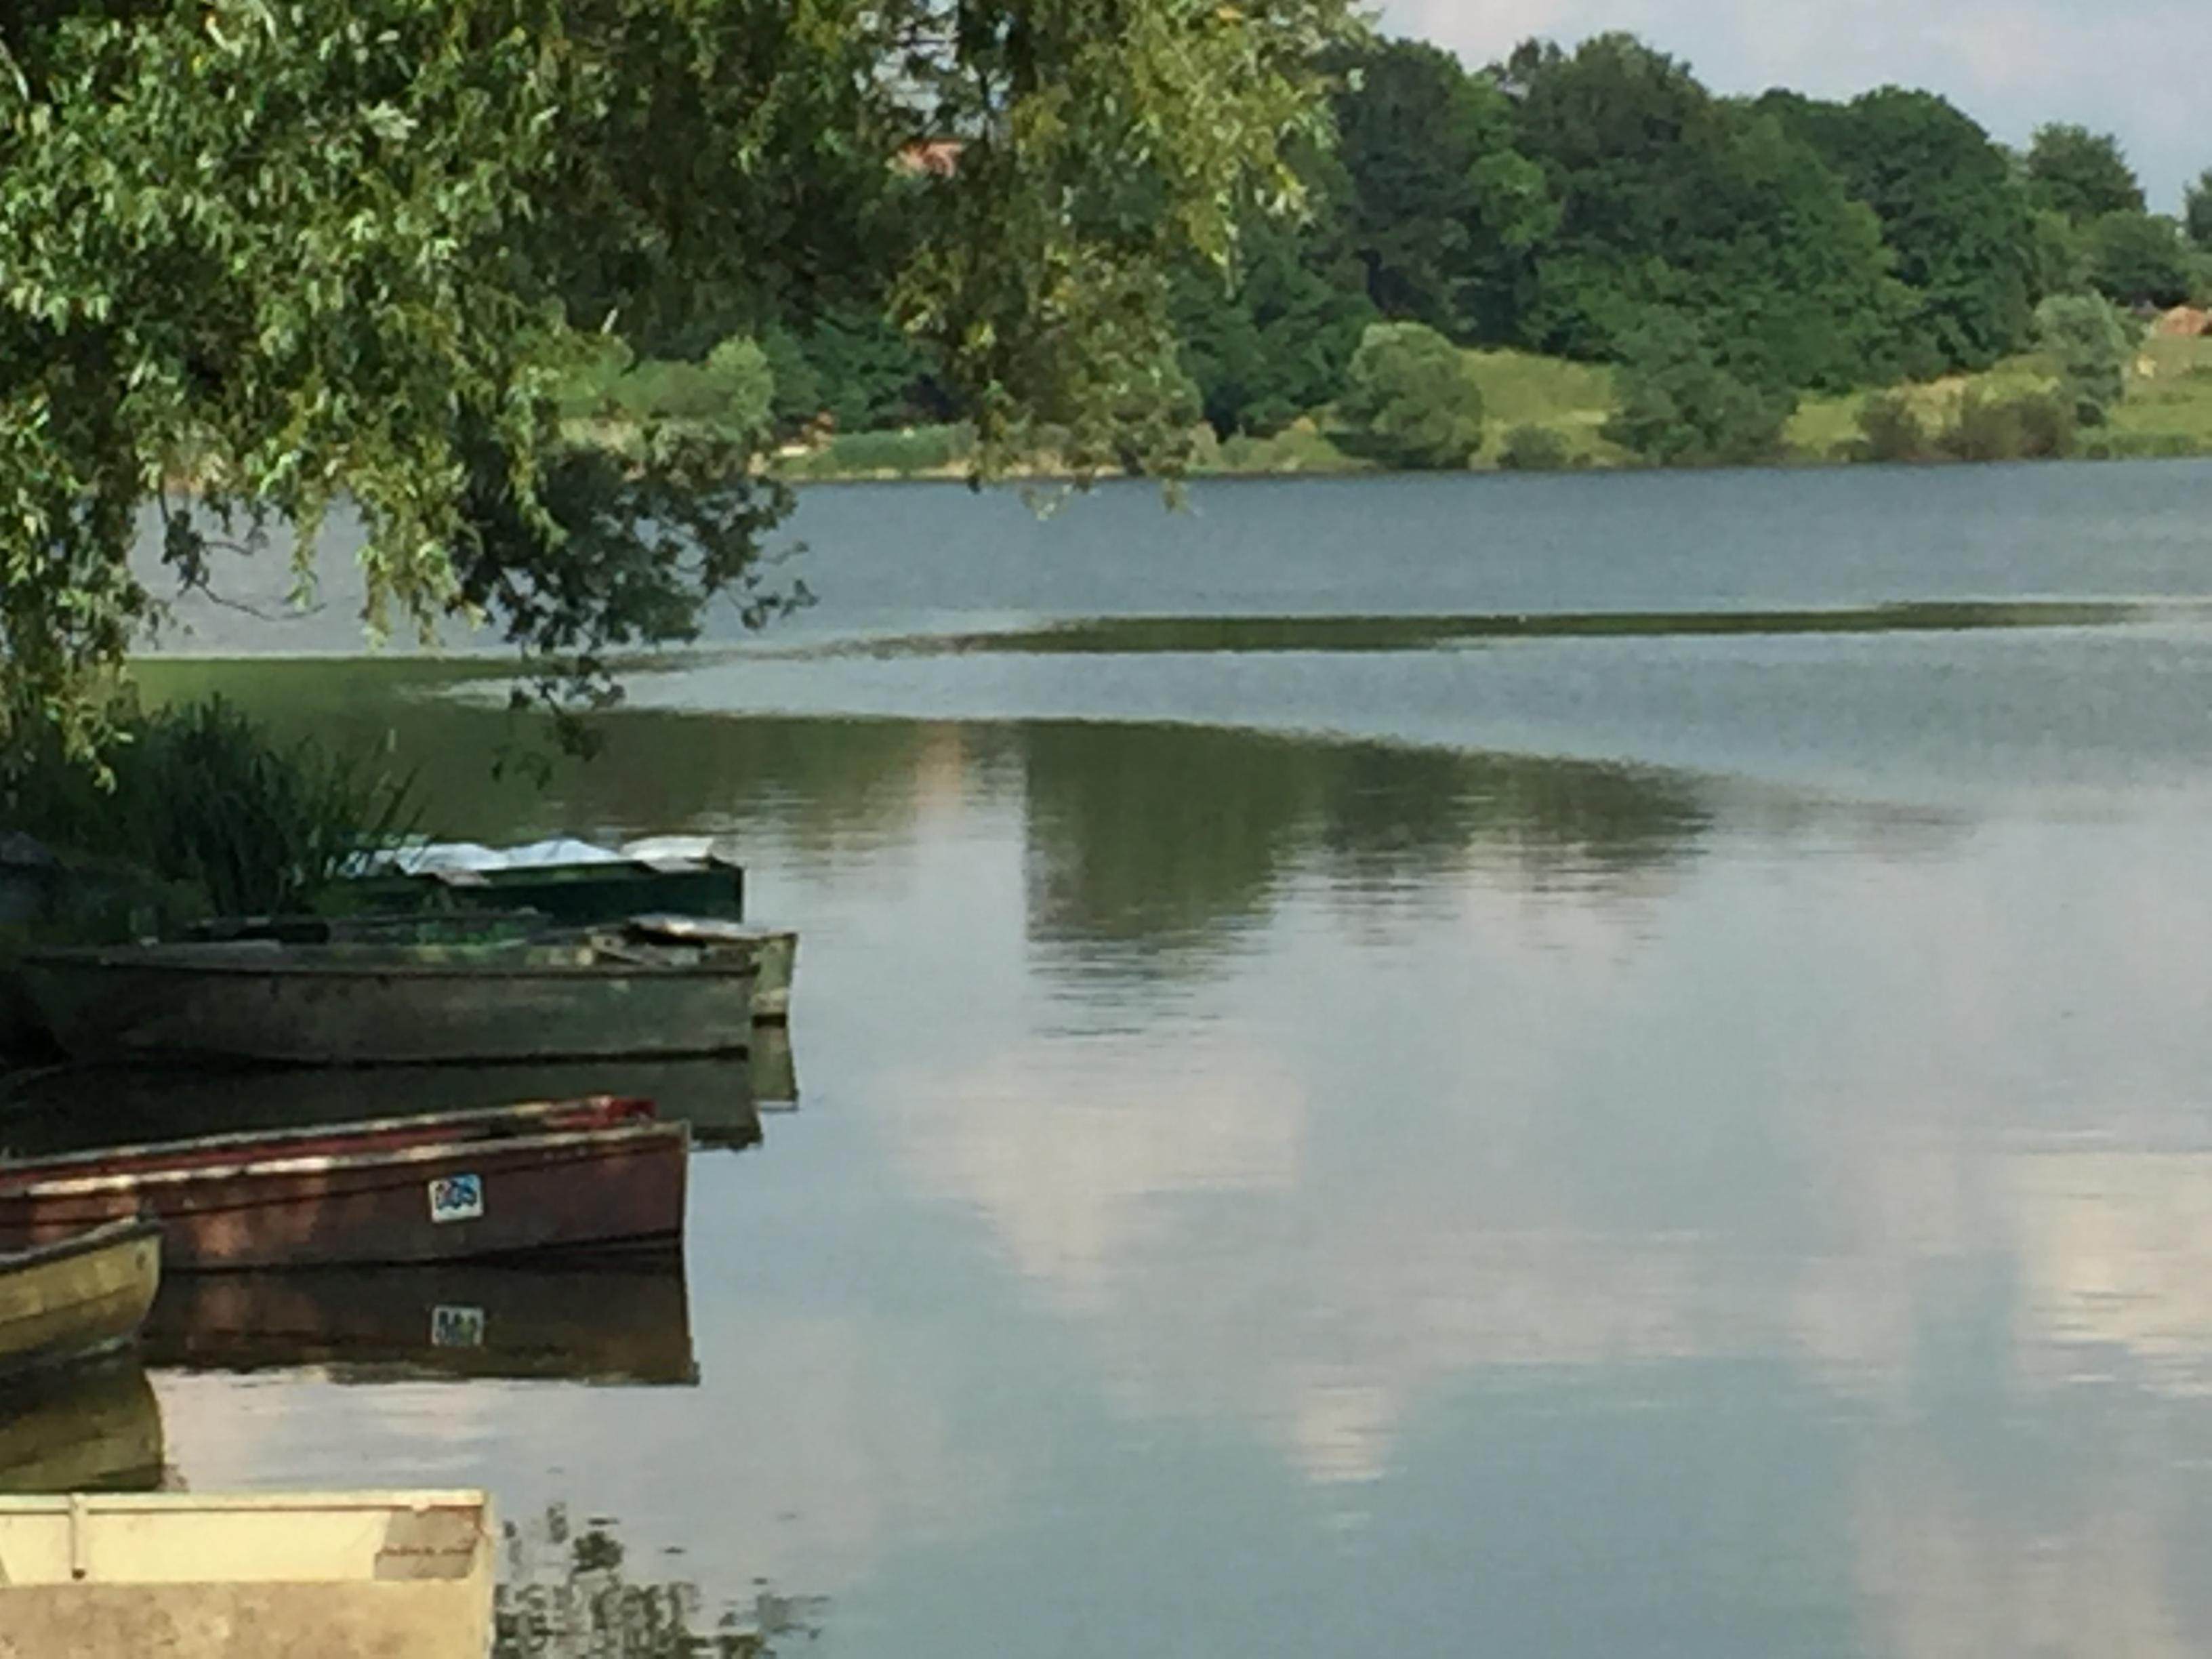 Pogled na jezero Radehova nedelja 4.6. 2017 zjutraj.